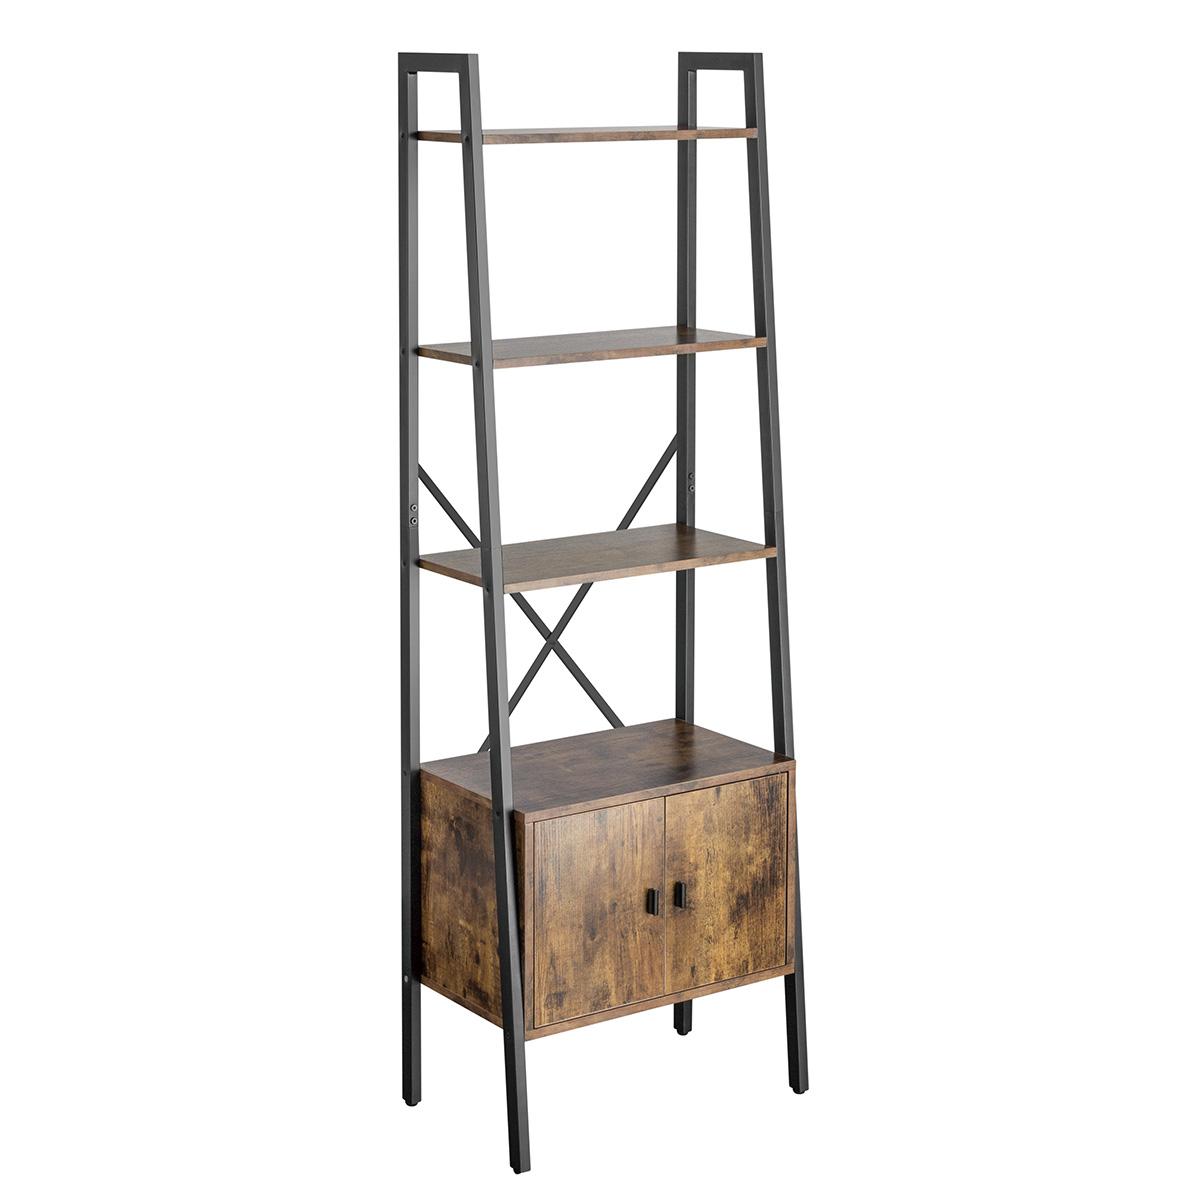 DL-13 Ladder Shelf with Enclosed Storage (Rustic Wood)